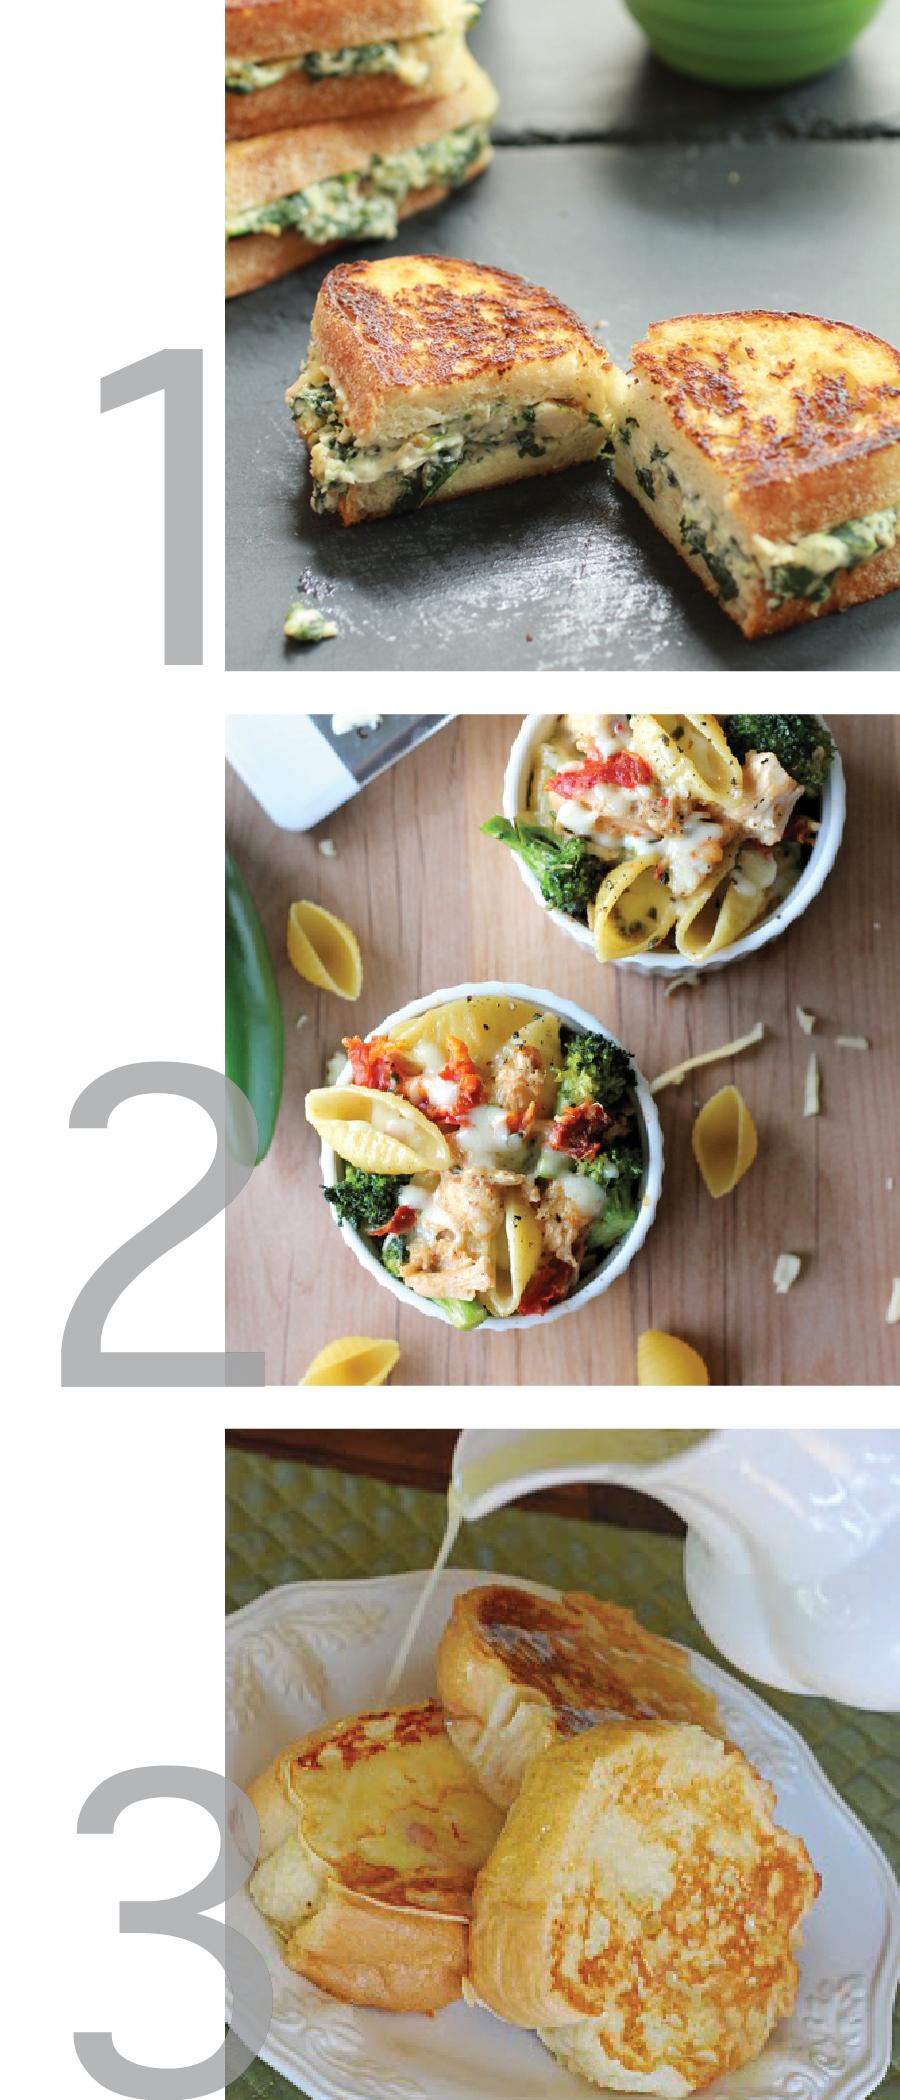 Weekly Pinspiration: Comfort Foods